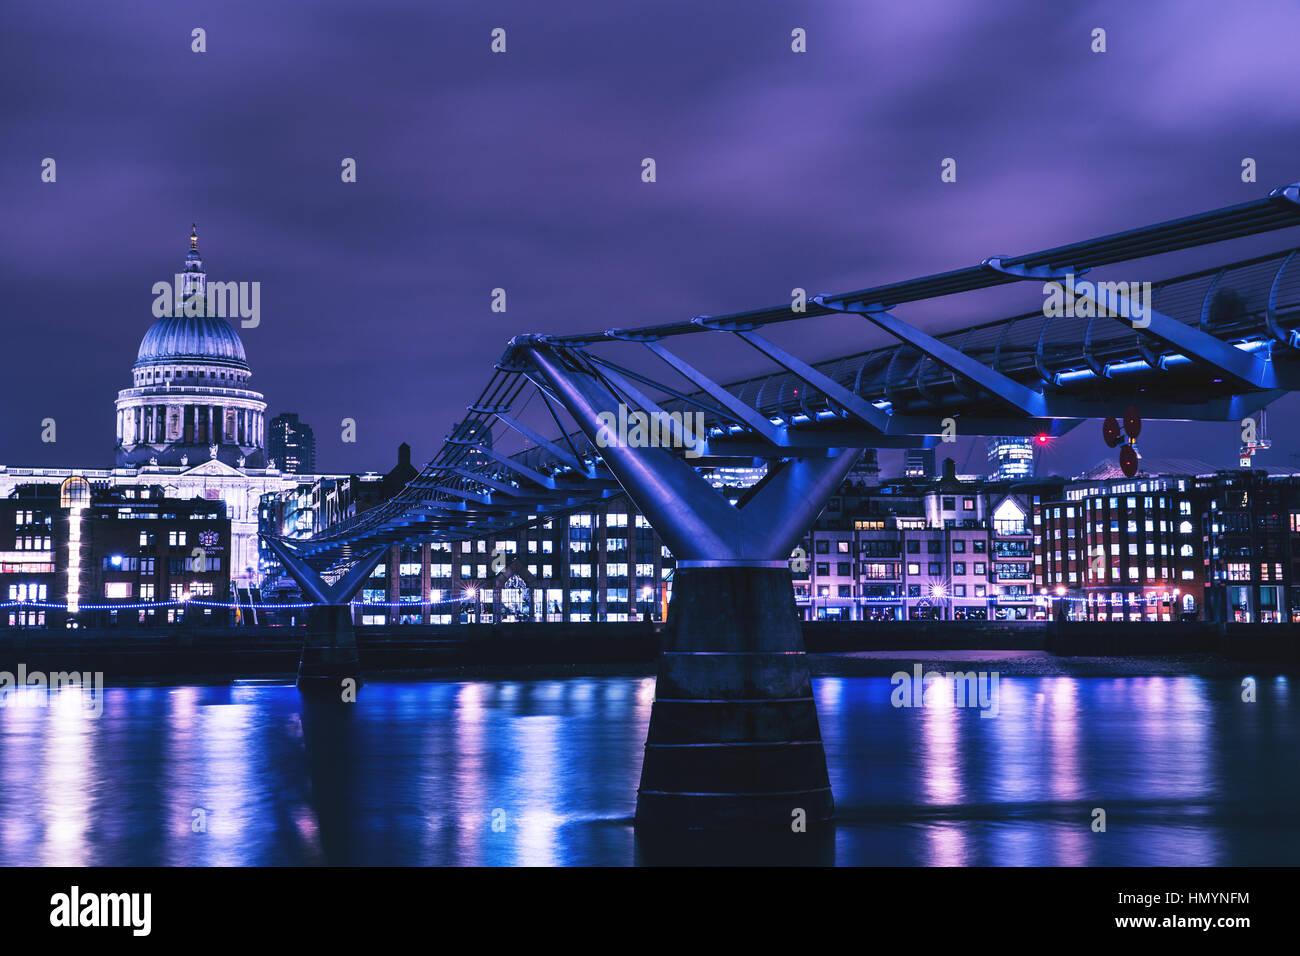 Millennium Bridge on River Thames at night - Stock Image